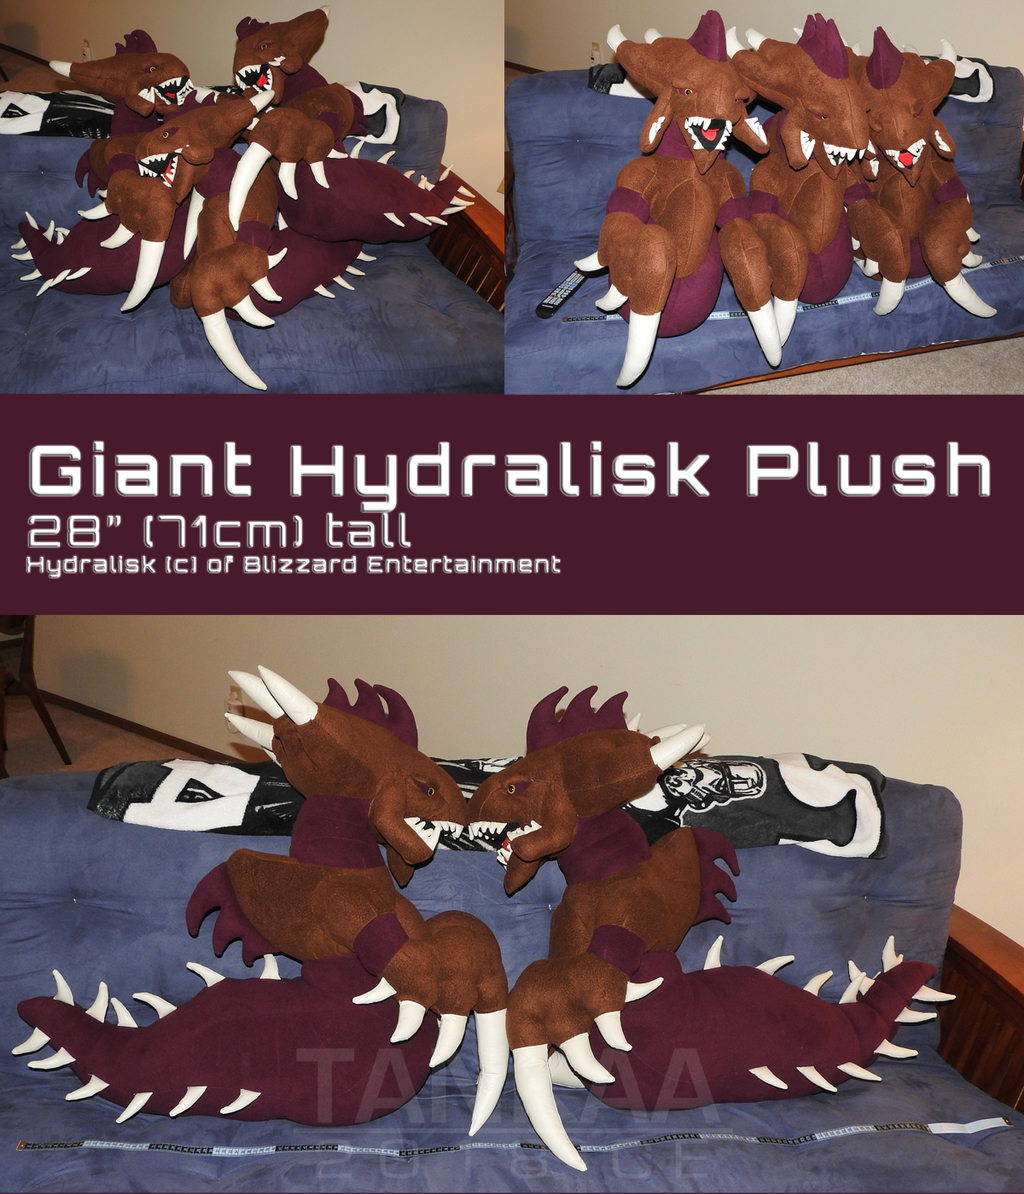 Giant Hydralisk Plush